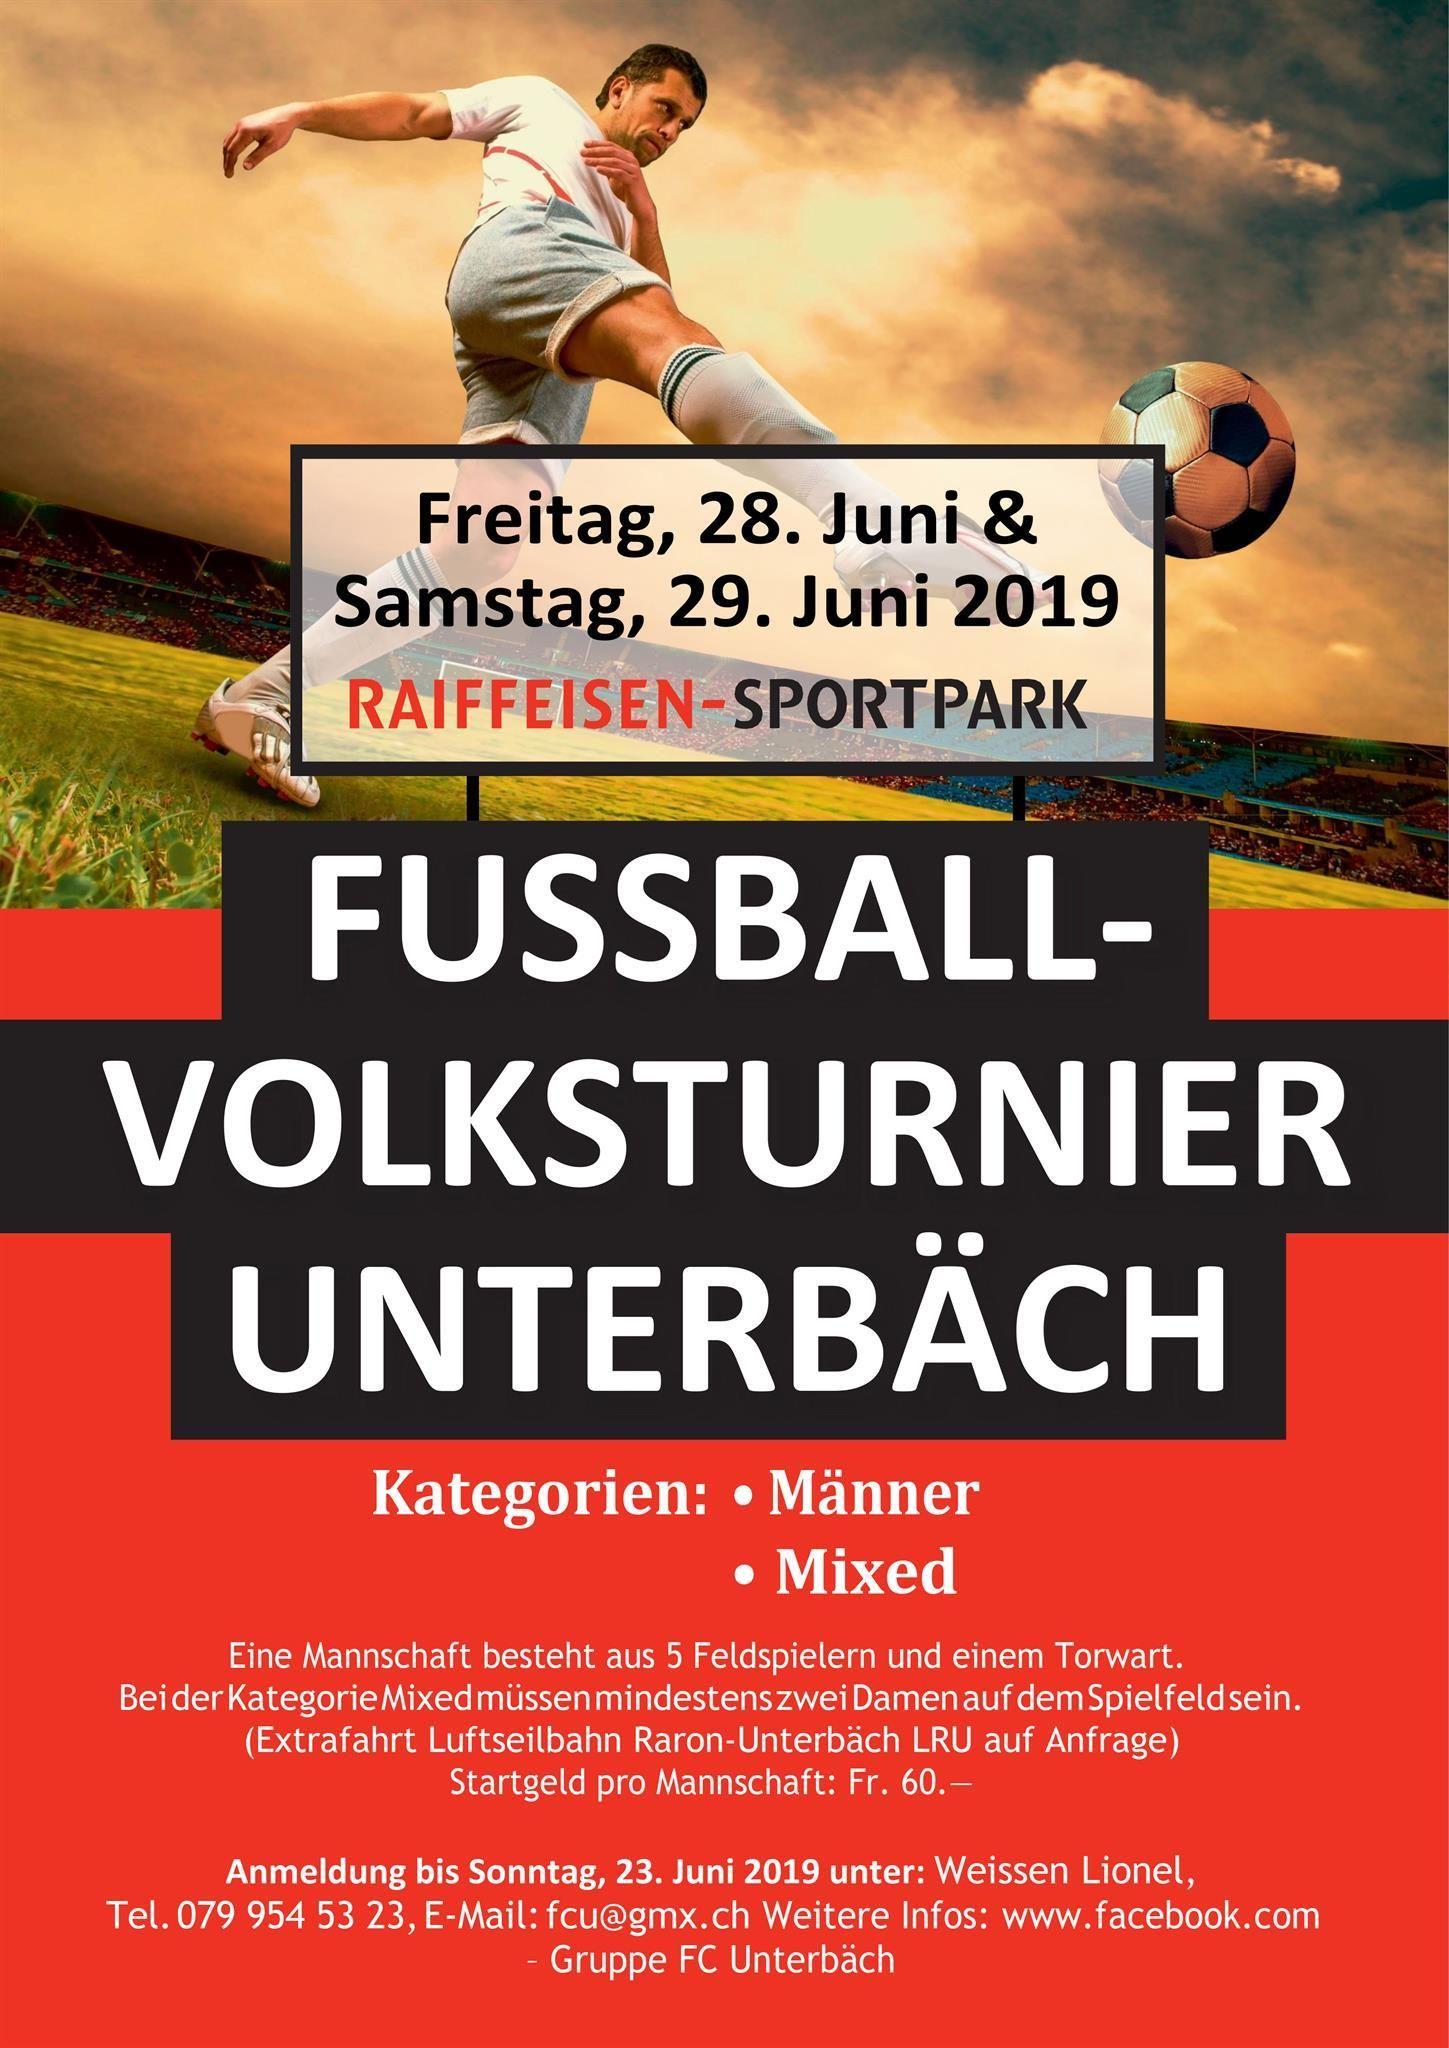 Dofrturnier Fussball